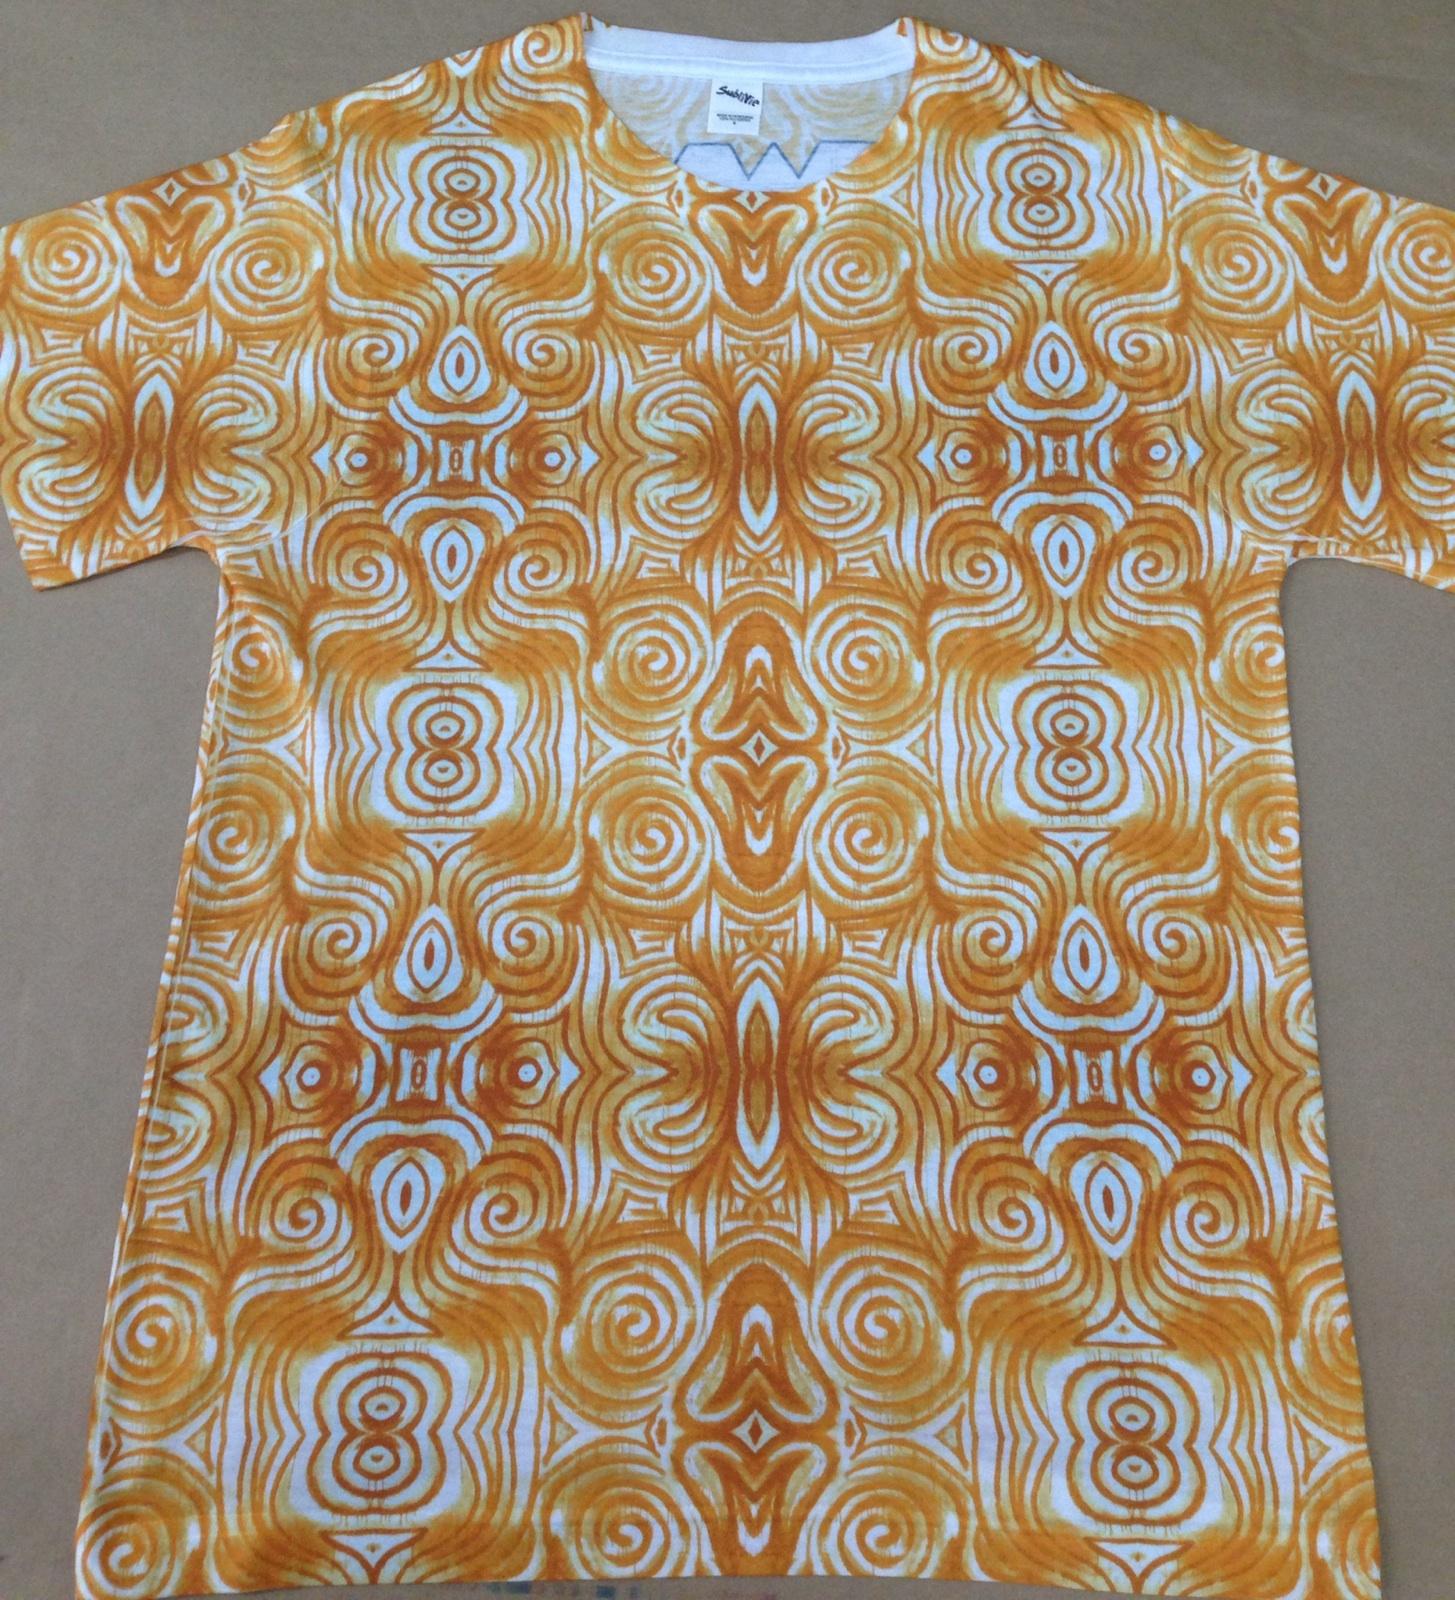 swirl shirt.JPG